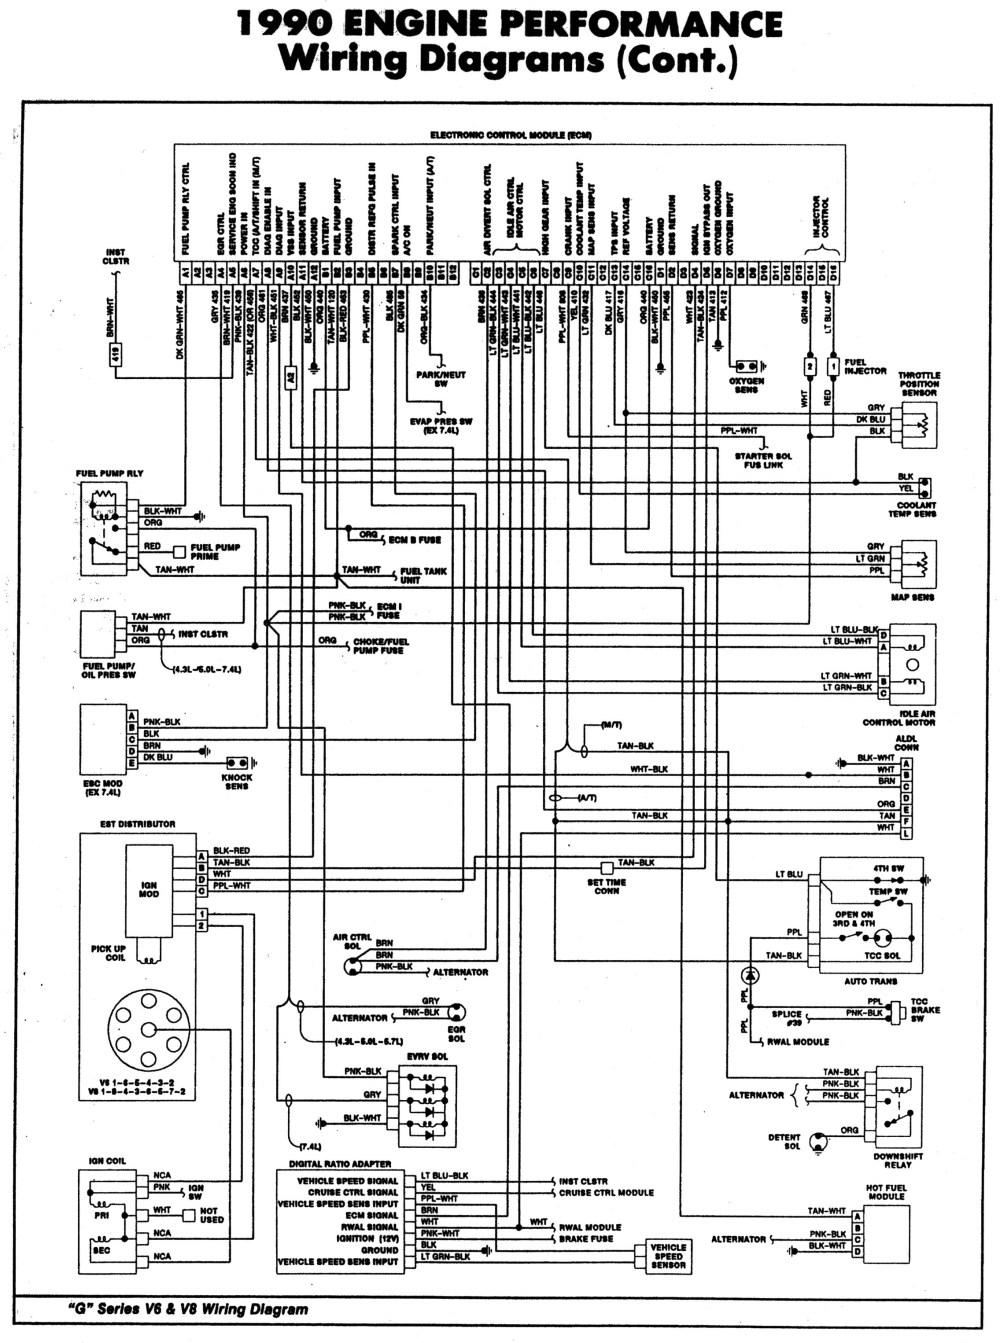 medium resolution of 2002 dodge ram 1500 4 7 engine diagram wiring diagram 2007 dodge ram 1500 copy 2002